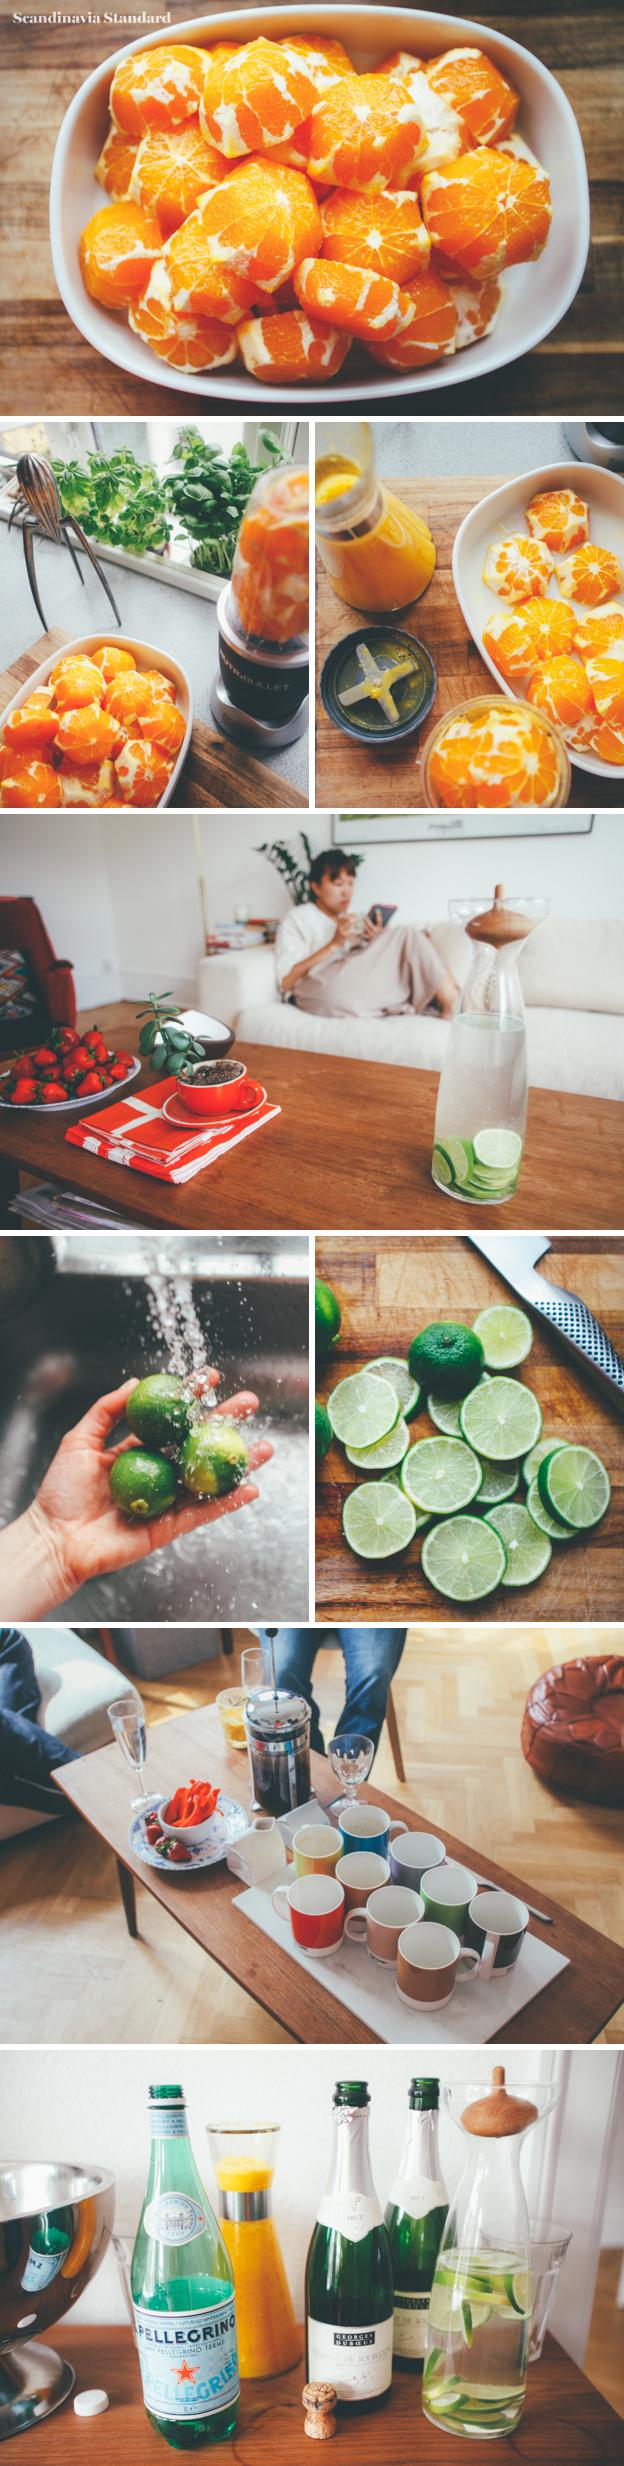 6. Danish Brunch Drinks - Champagne, Lime Water & Fresh Orange Juice | Scandinavia Standard